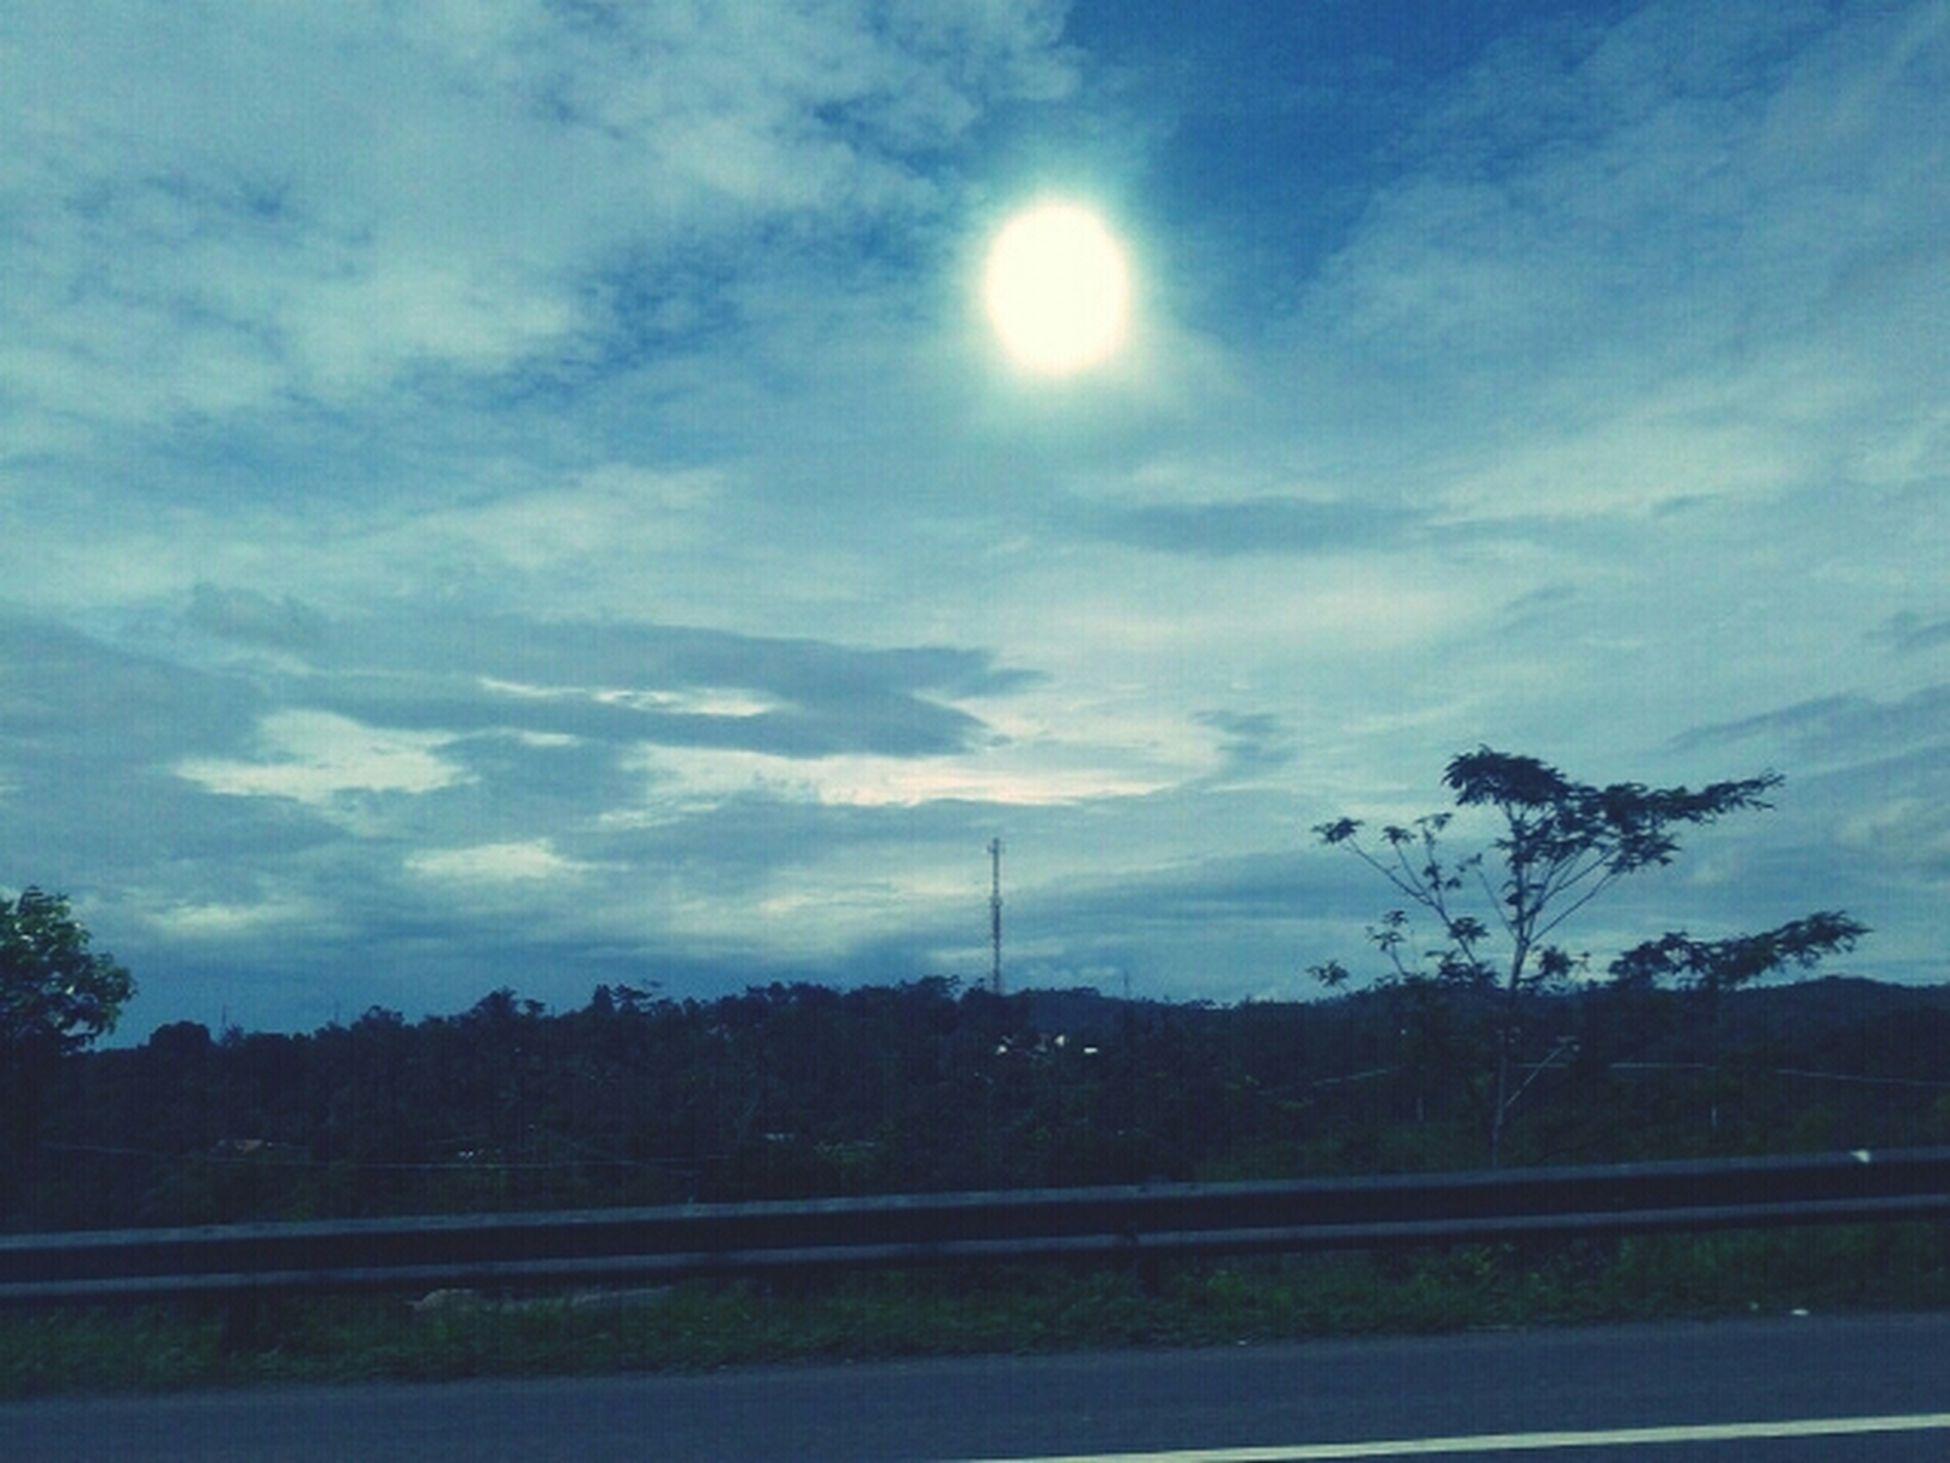 sky, tree, cloud - sky, tranquility, sun, silhouette, tranquil scene, nature, road, scenics, beauty in nature, sunlight, landscape, cloud, electricity pylon, field, power line, cloudy, sunbeam, transportation